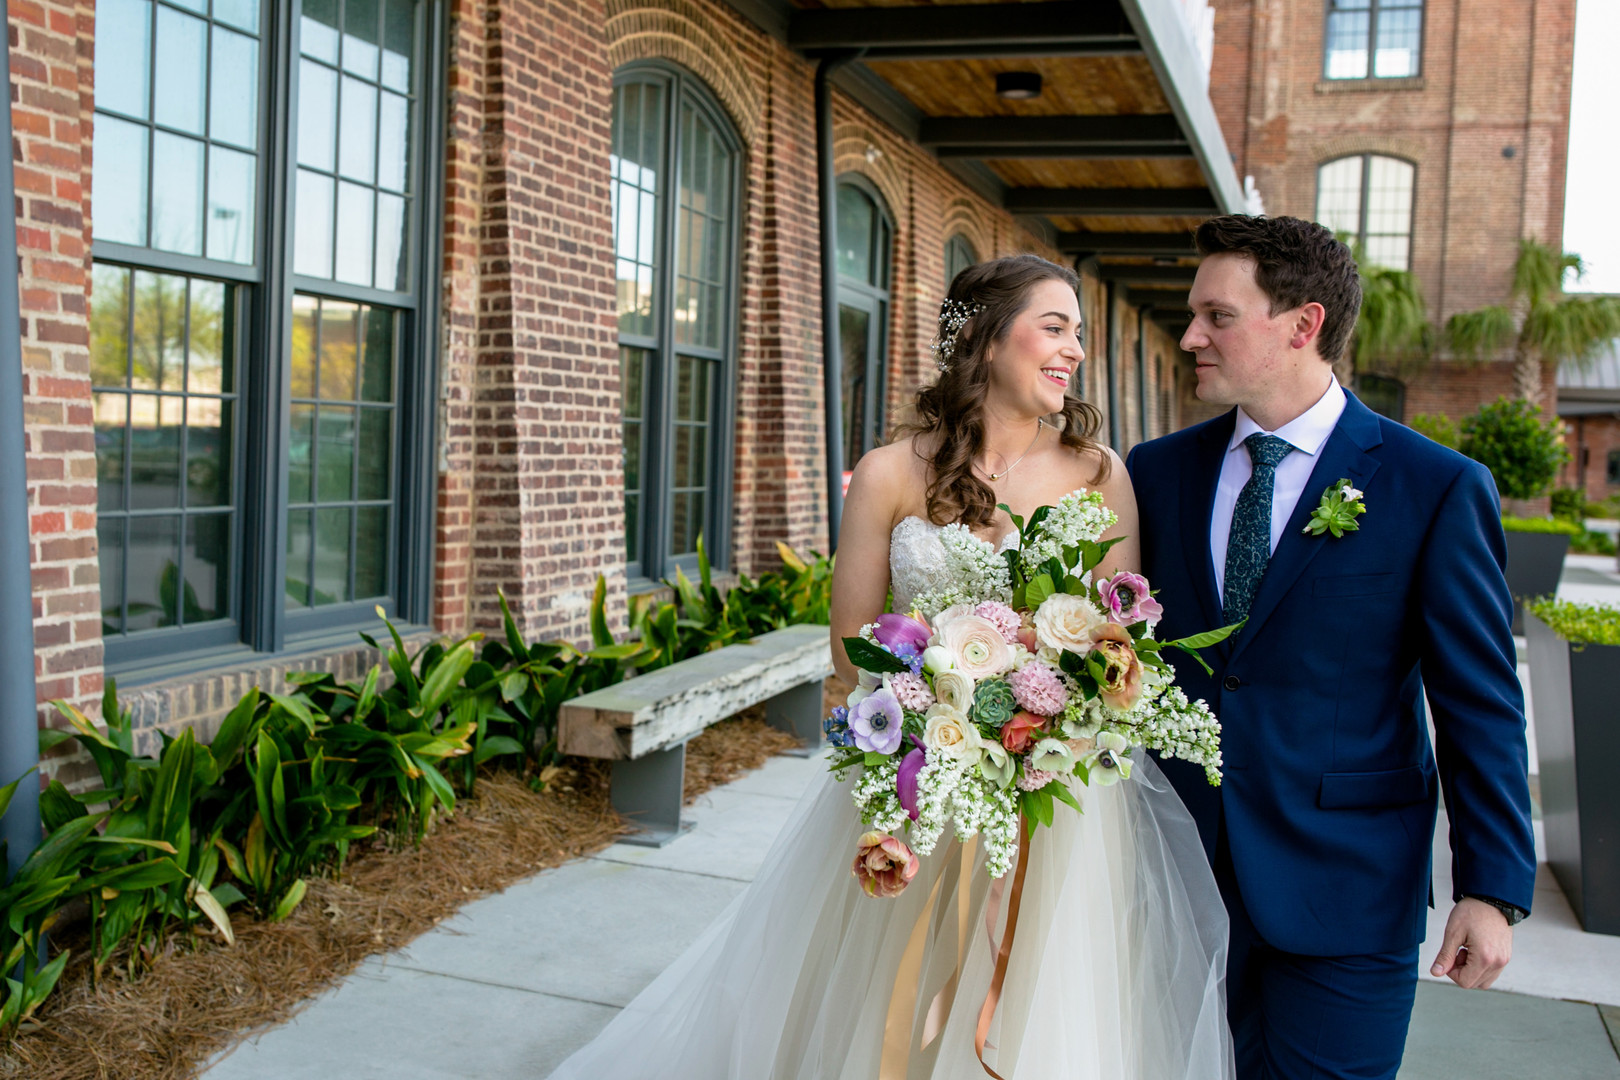 cedar-room-wedding-16.jpg